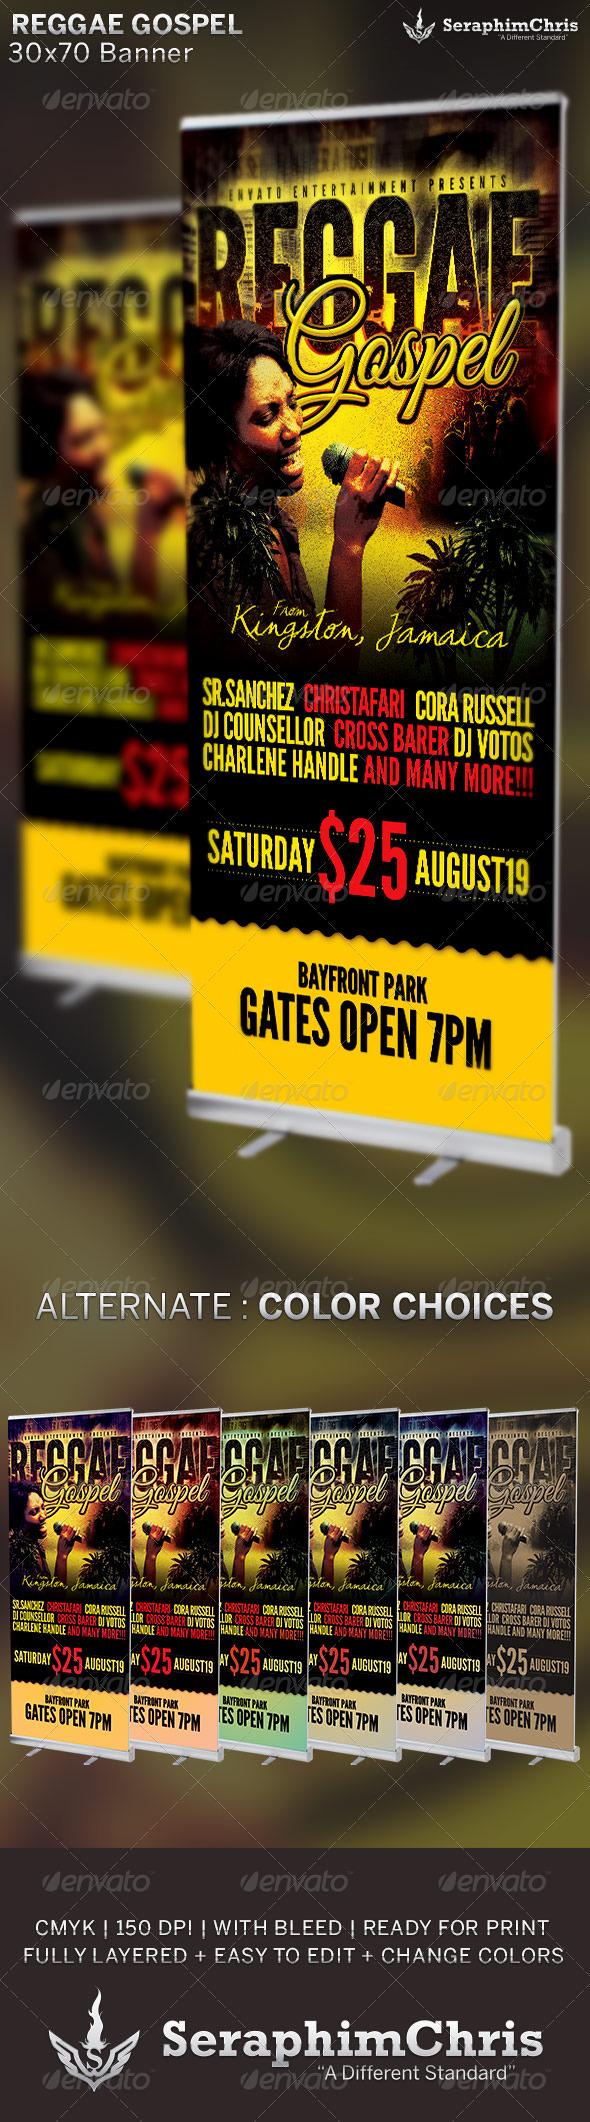 Reggae Gospel Concert: Banner Template - Signage Print Templates